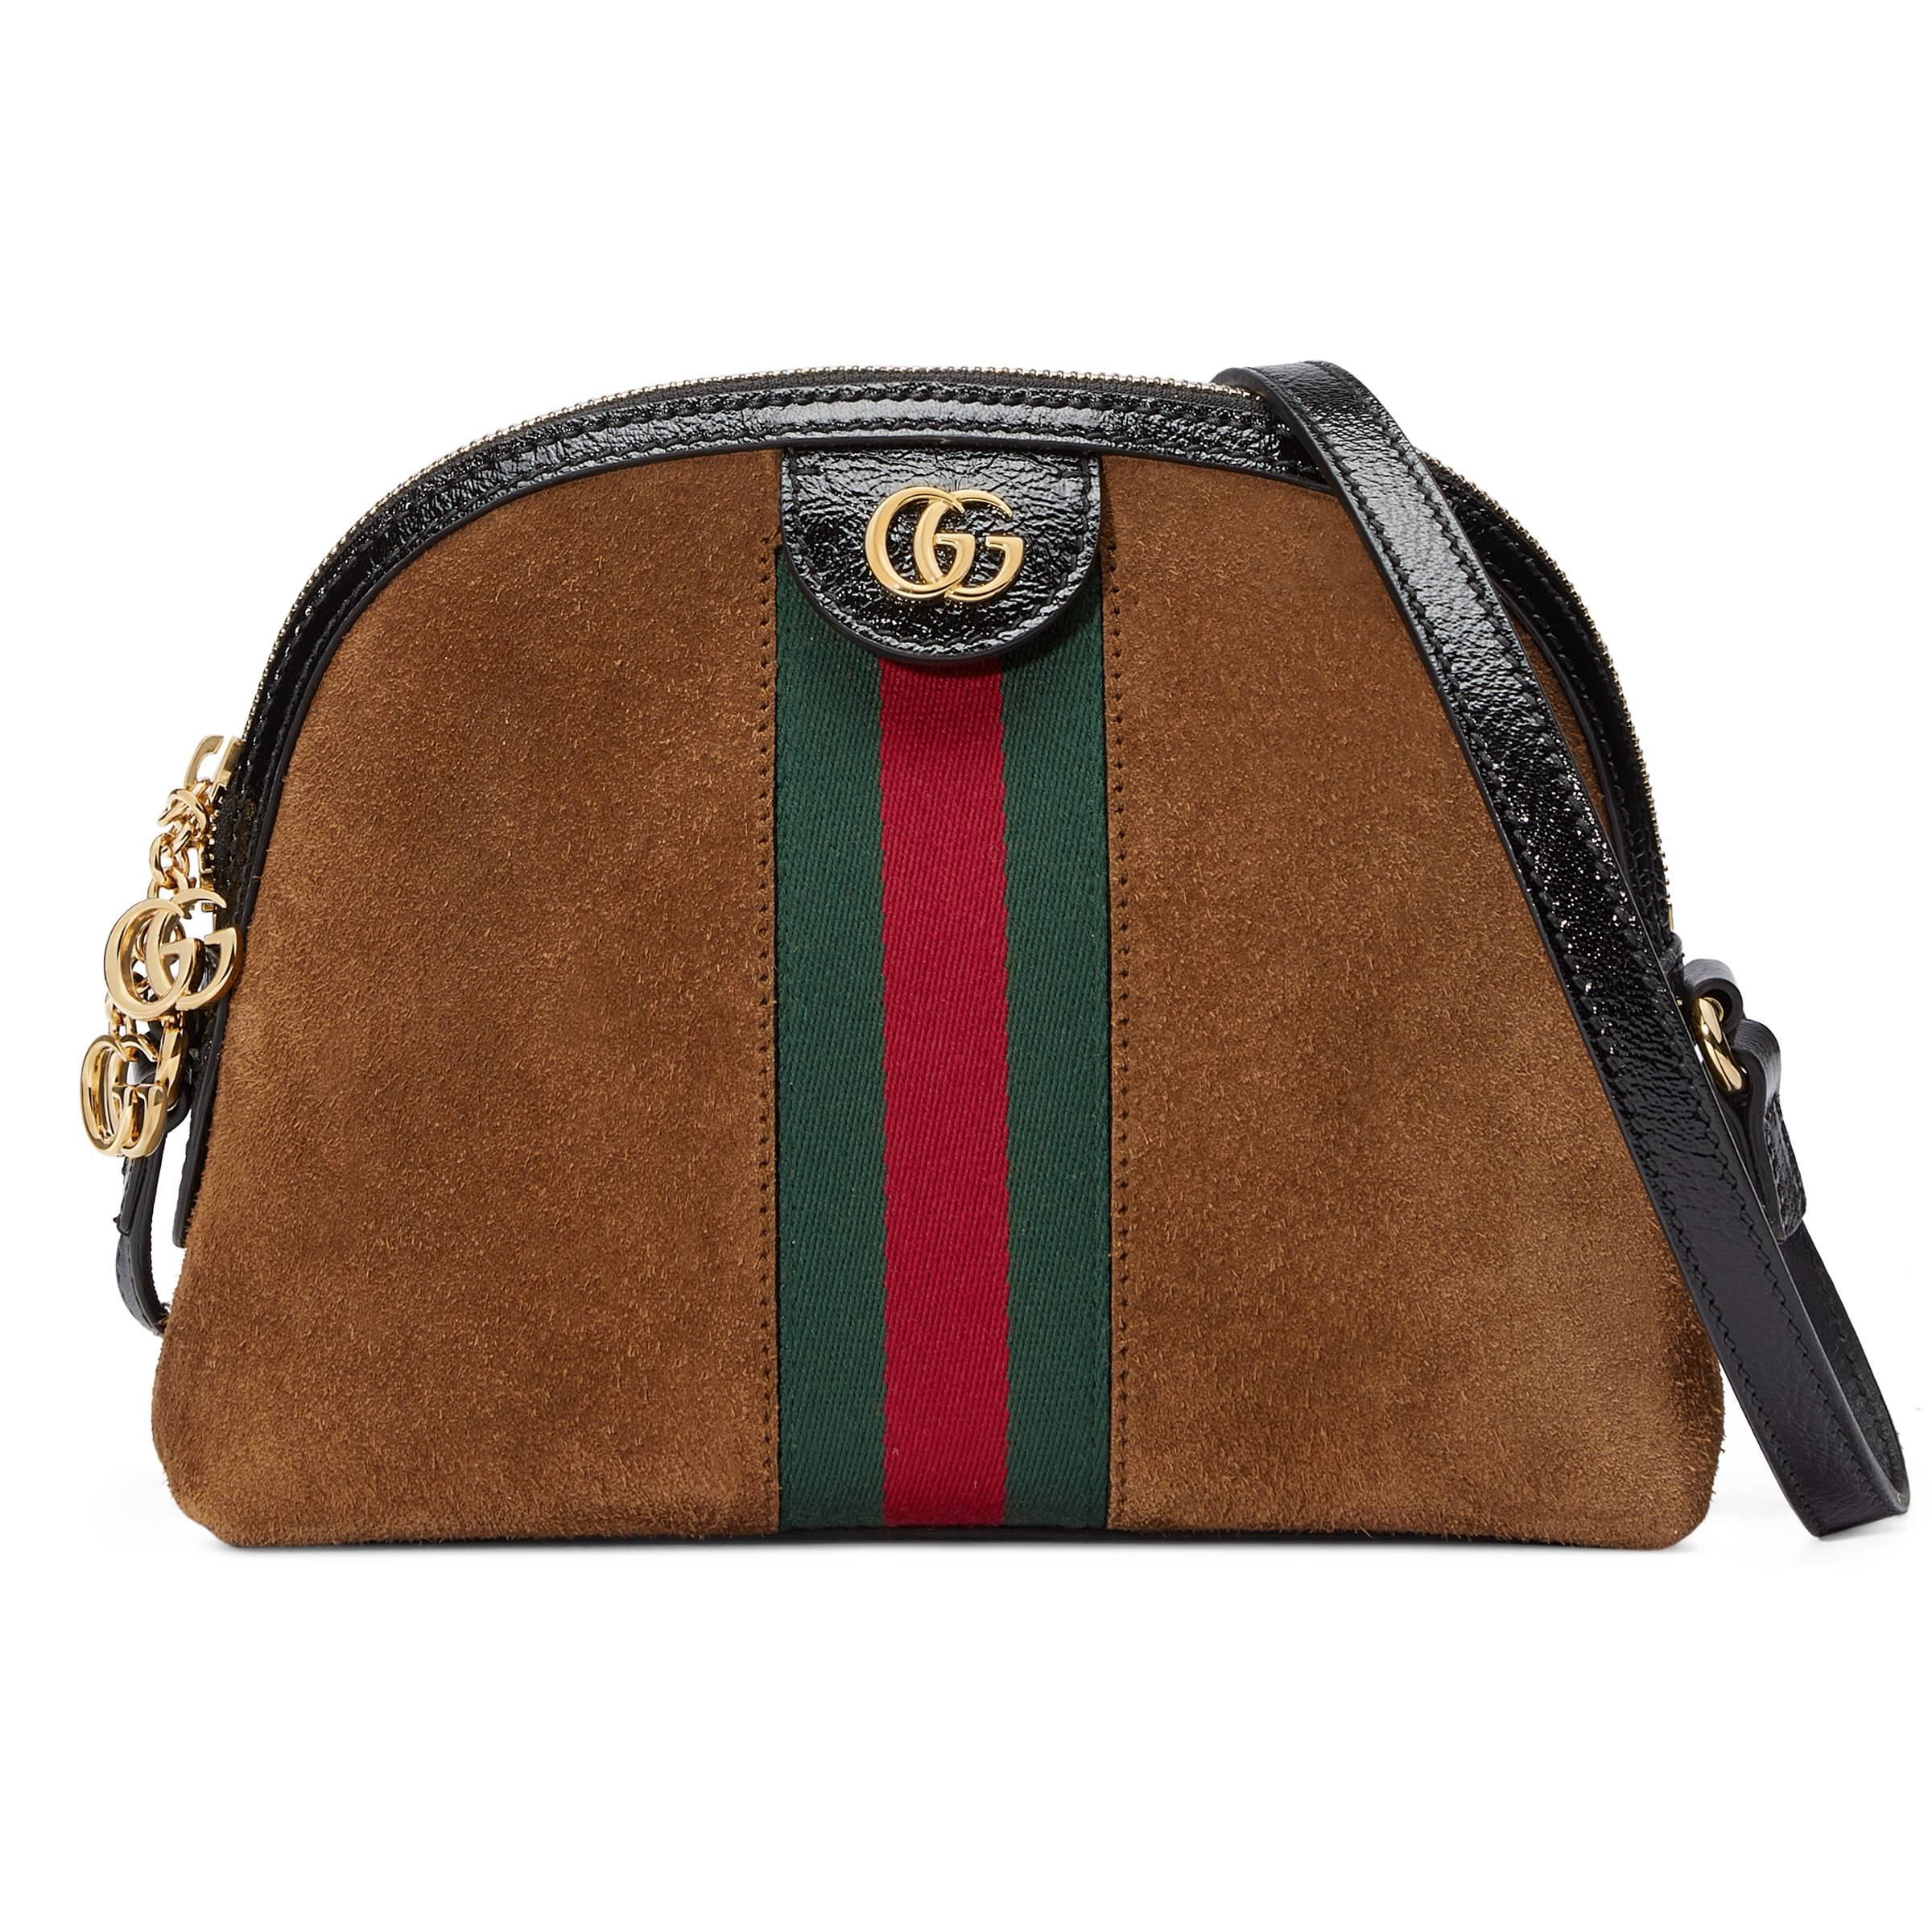 1161871a78e Gucci Linea Dragoni Suede Small Chain Shoulder Bag in Brown - Save ...